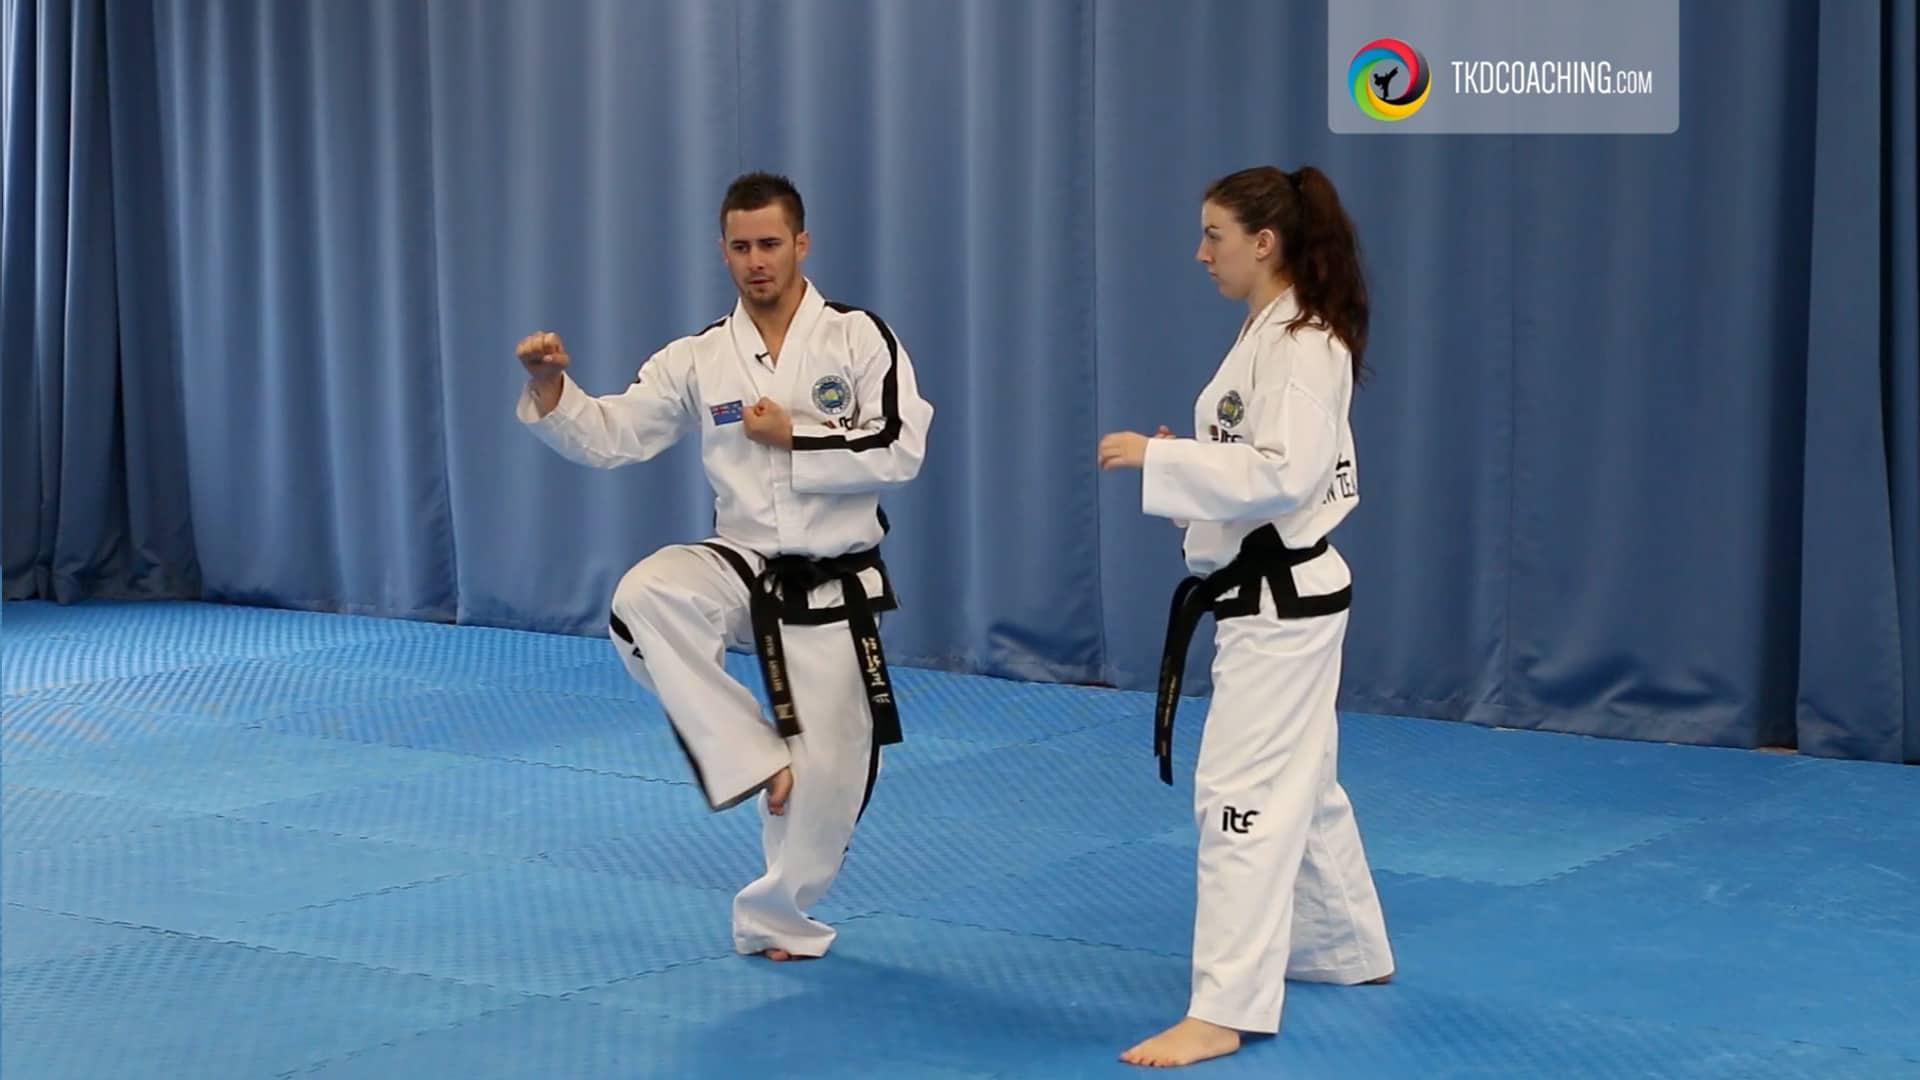 Choong-Moo bending ready stance